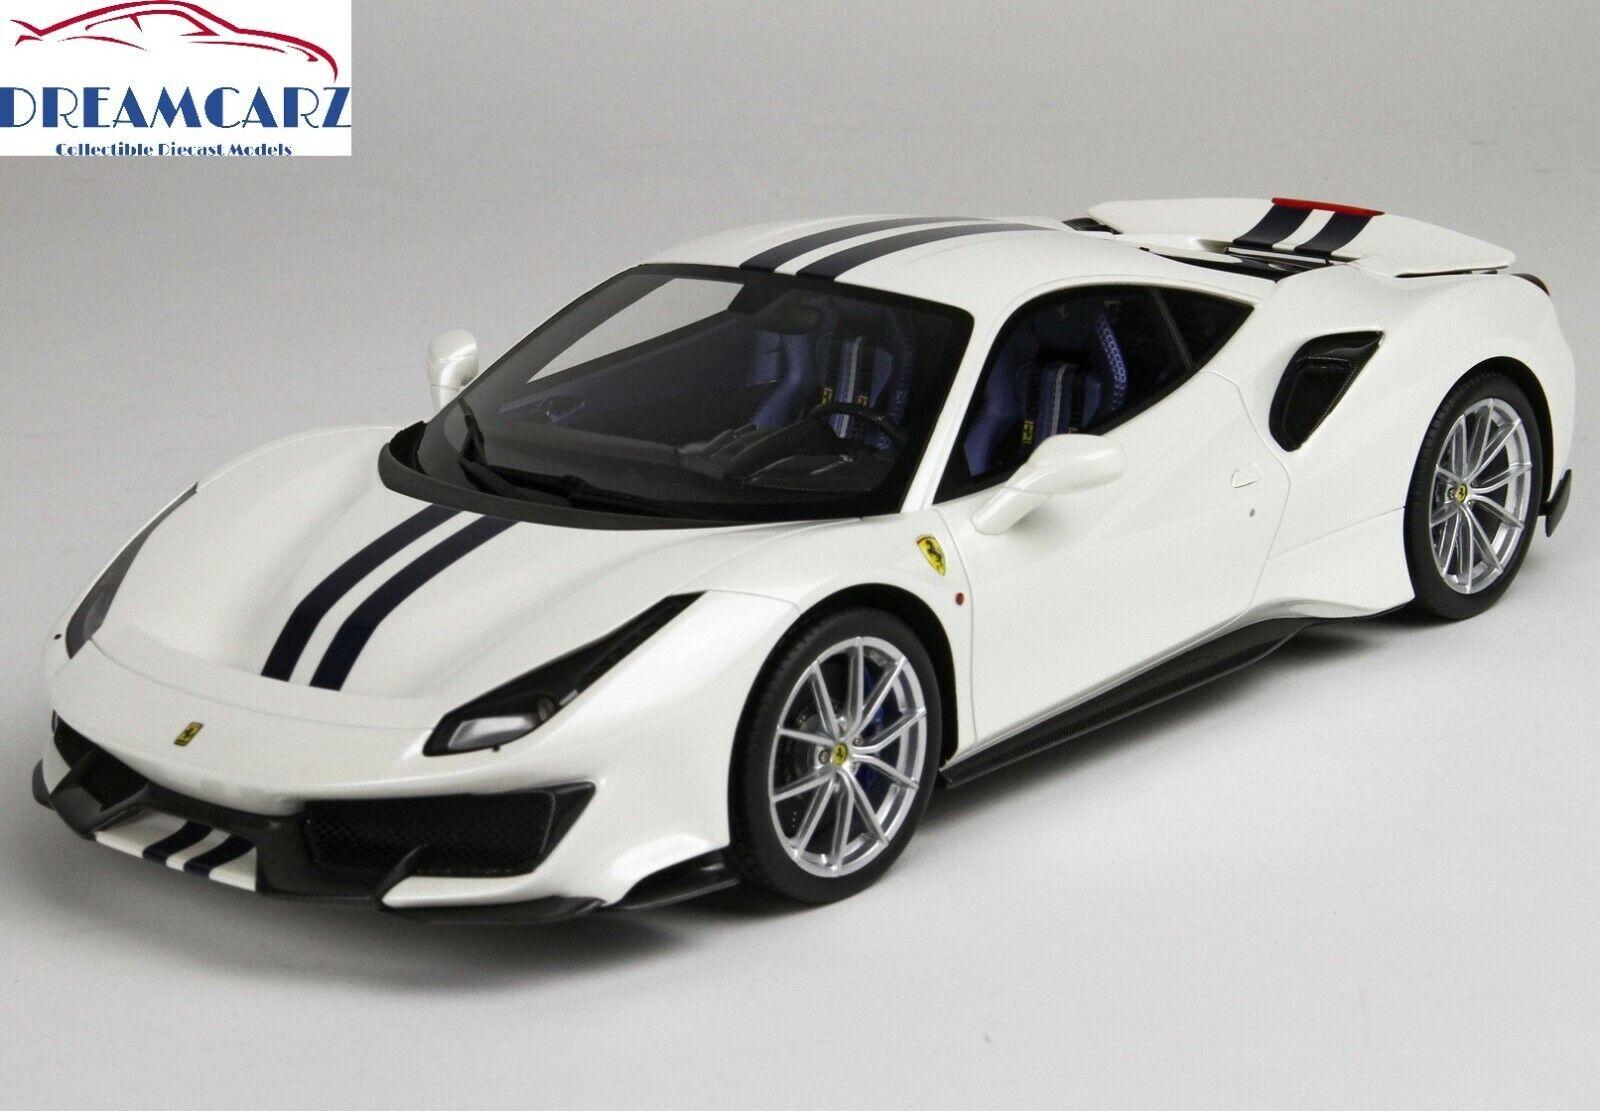 BBR P18145F 1  18 Ferrari 488 Pista 2018 - Mycket begränsad 32 pcs